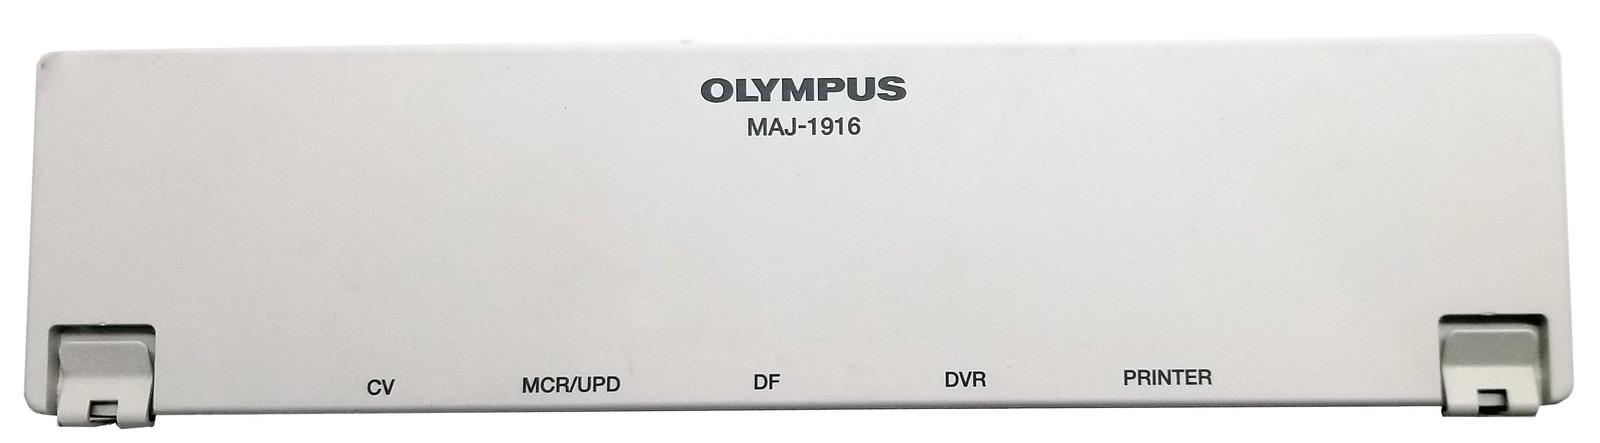 Olympus Maj-1916 CV Interface Converter Device Bin:7